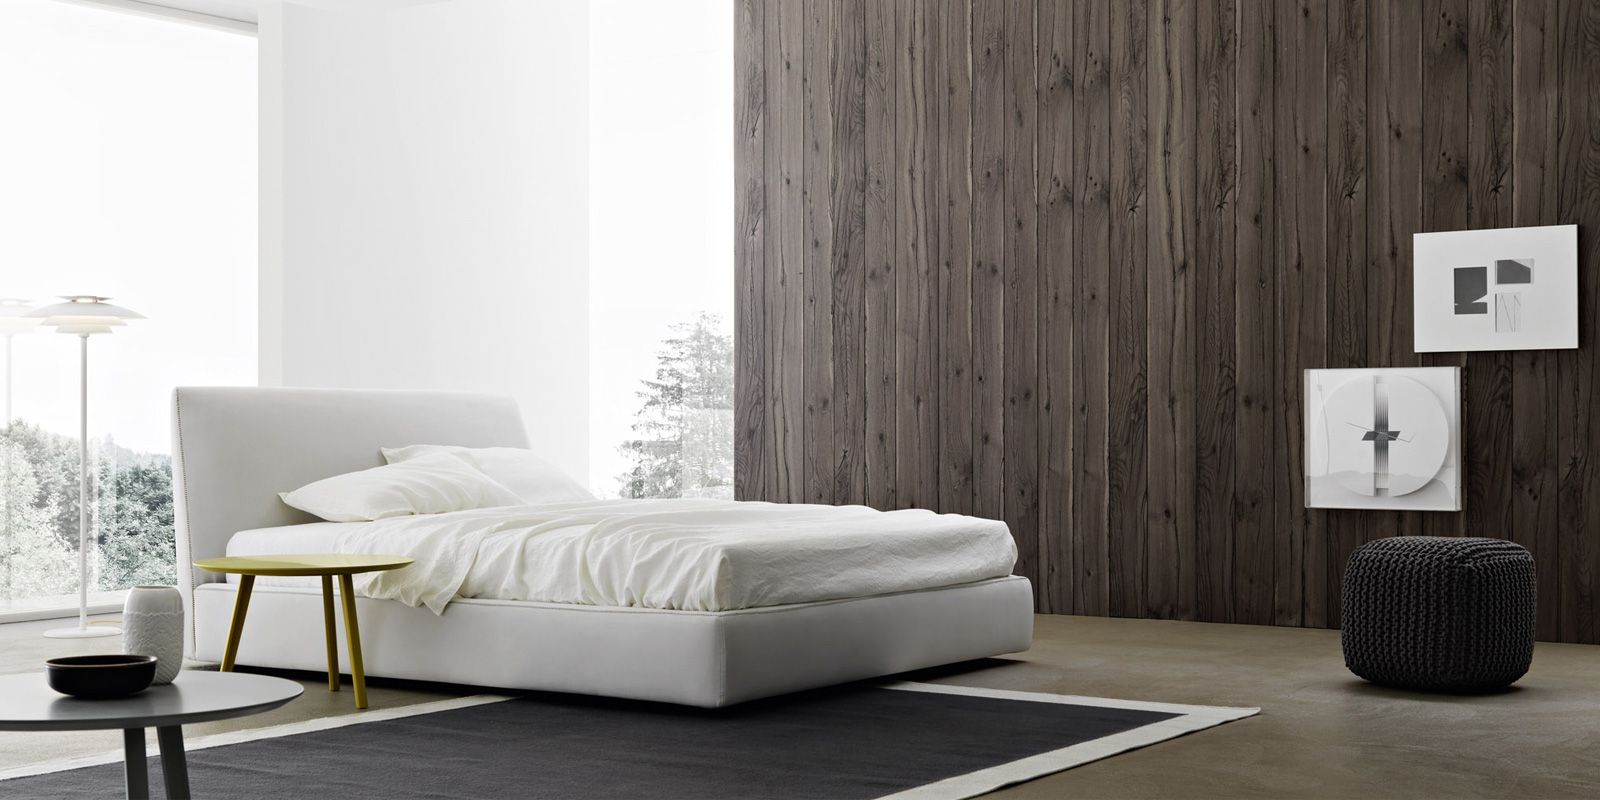 Camere da letto Mobilificio San Giacomo,letto Atelier #rifarecasa ...